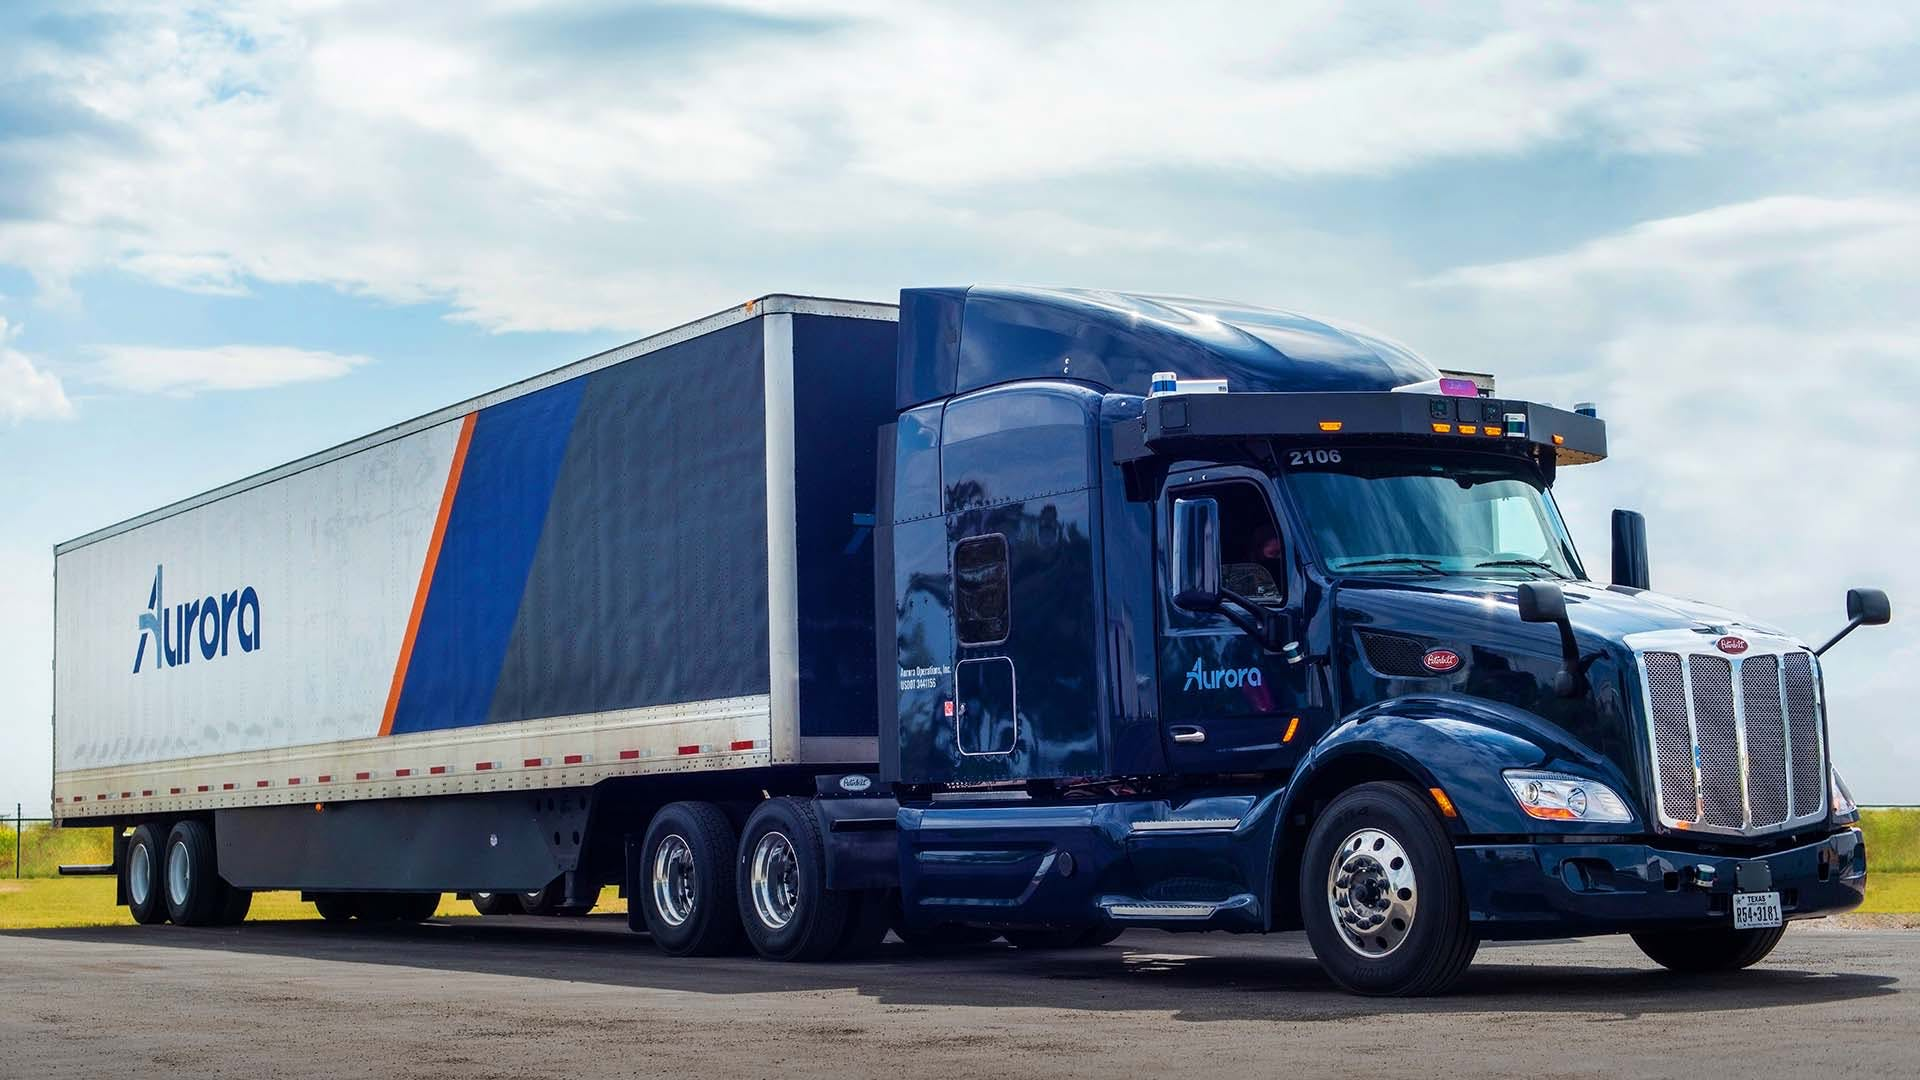 Aurora Self-Driving Truck